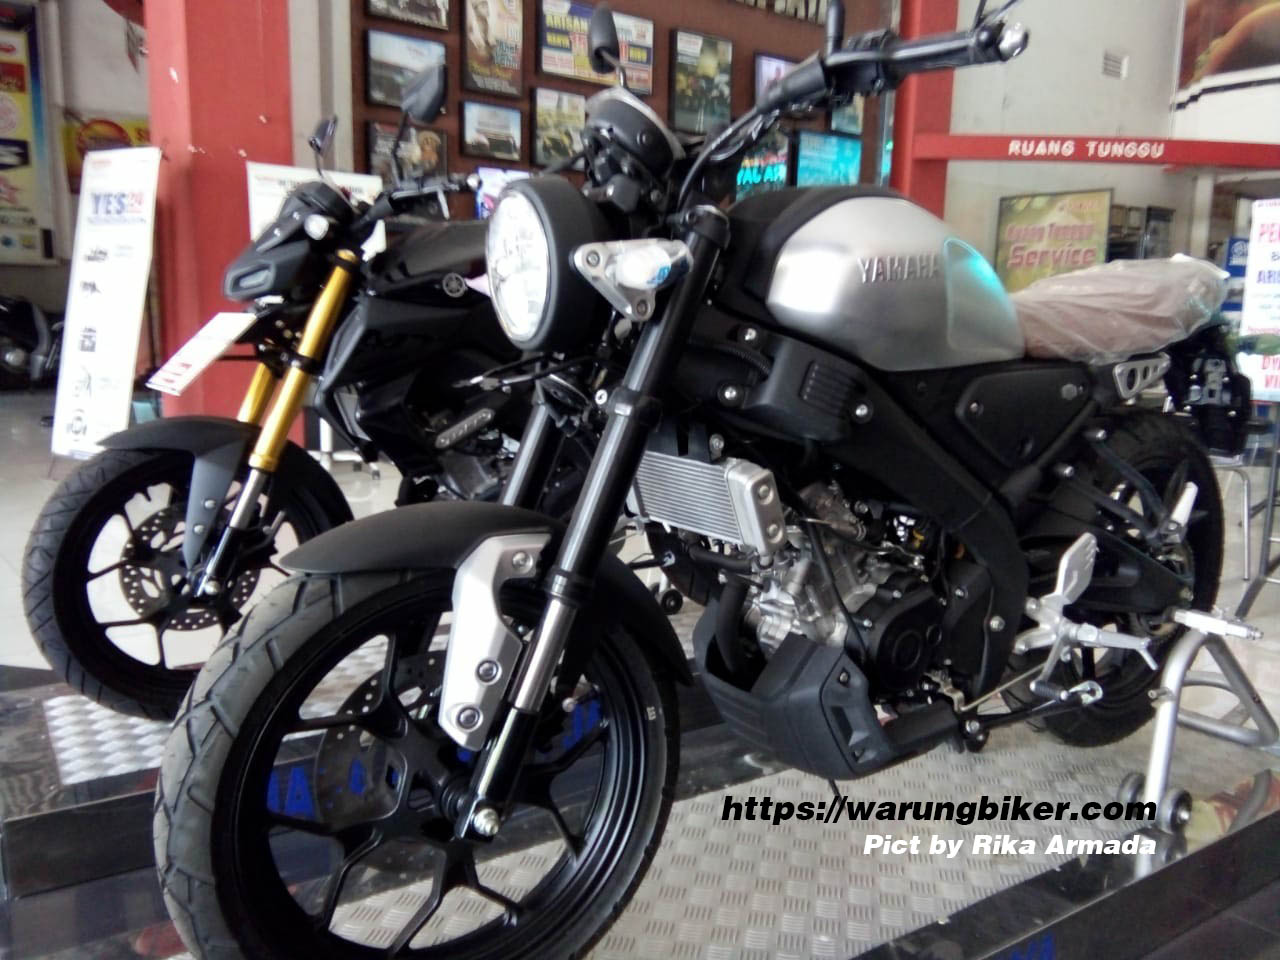 GerCep, Yamaha XSR 155 Sudah Sampai Kediri, Harga 36 Jutaan (2)